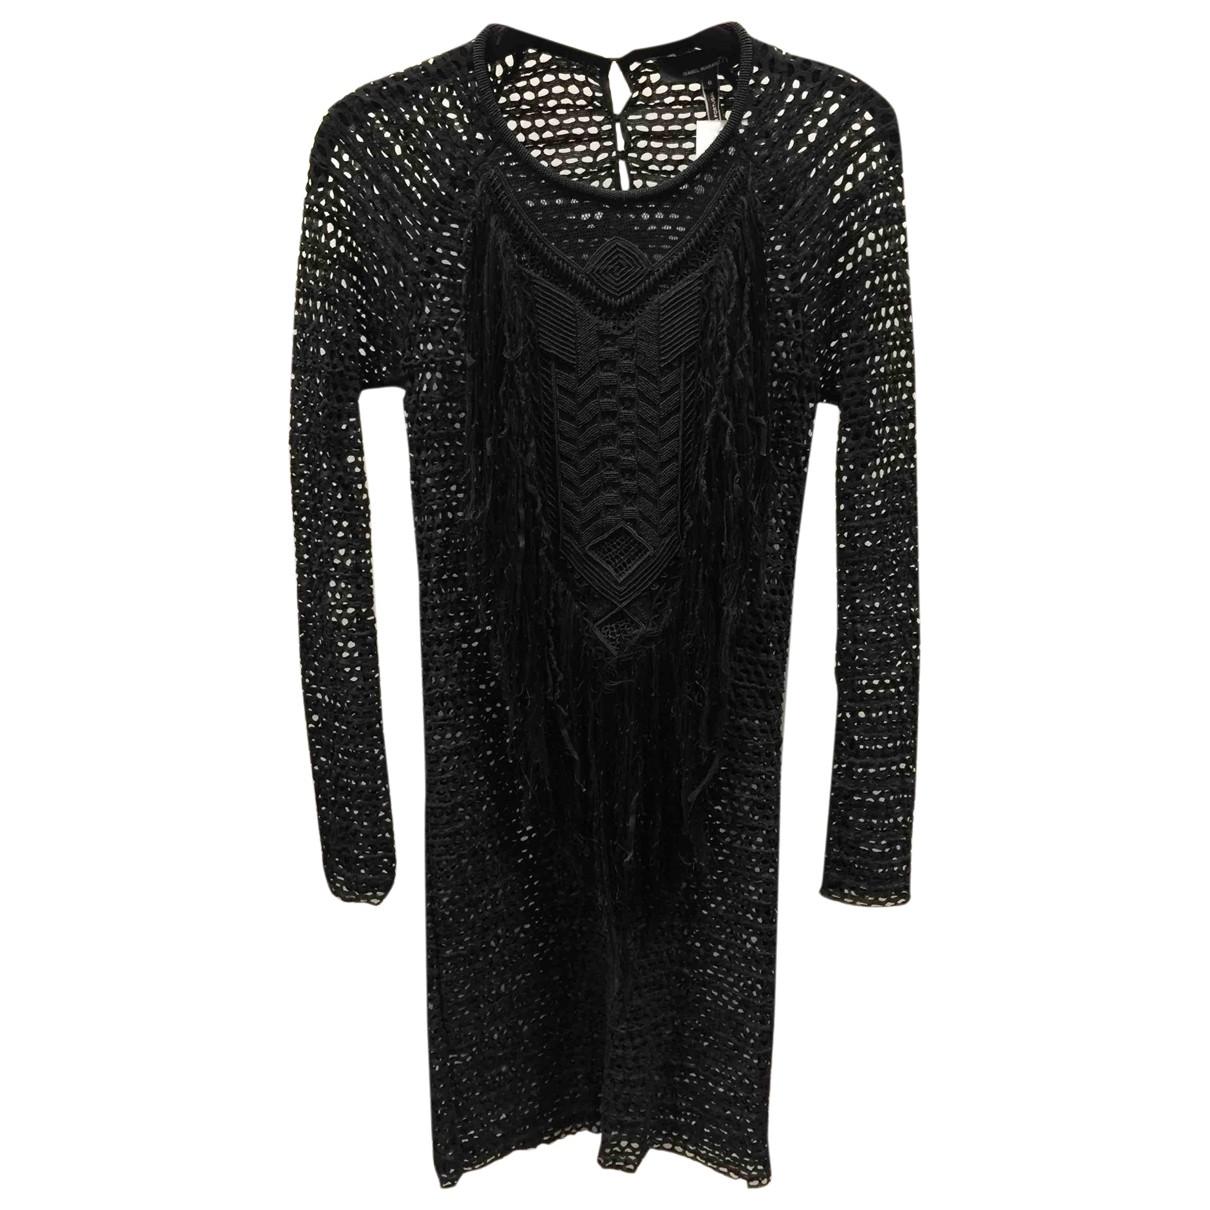 Isabel Marant \N Black Cotton dress for Women 0 0-5